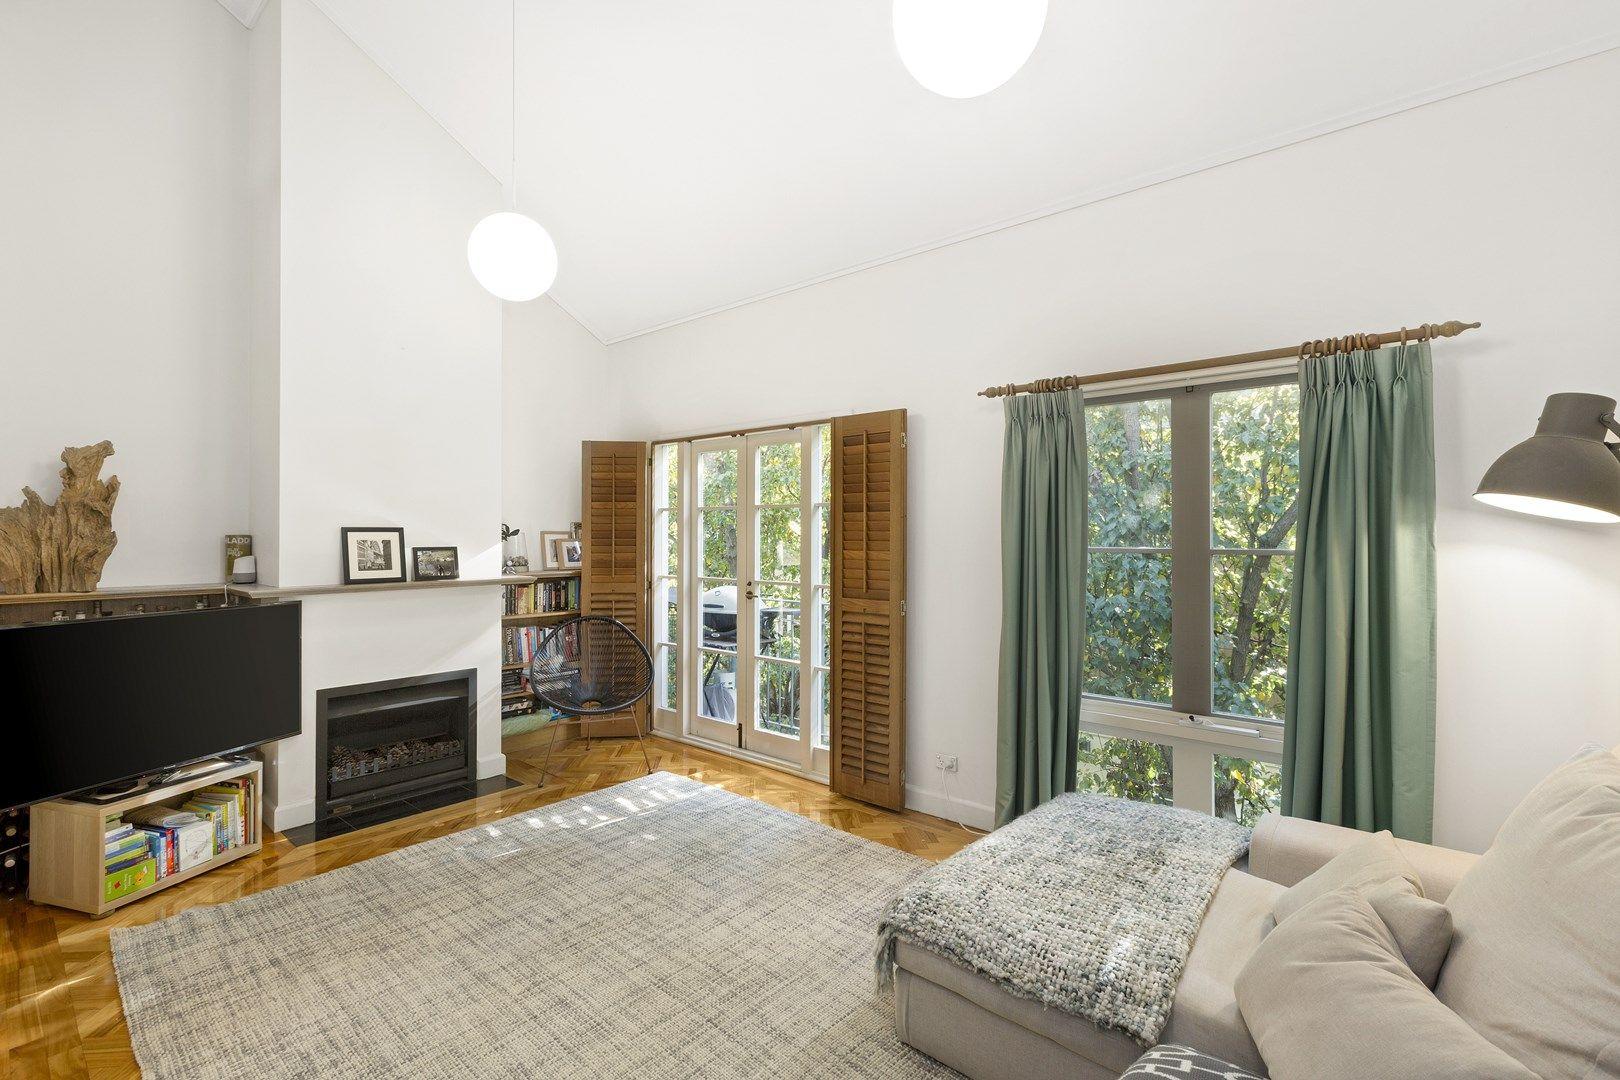 27/8 Wellington Crescent, East Melbourne VIC 3002, Image 1